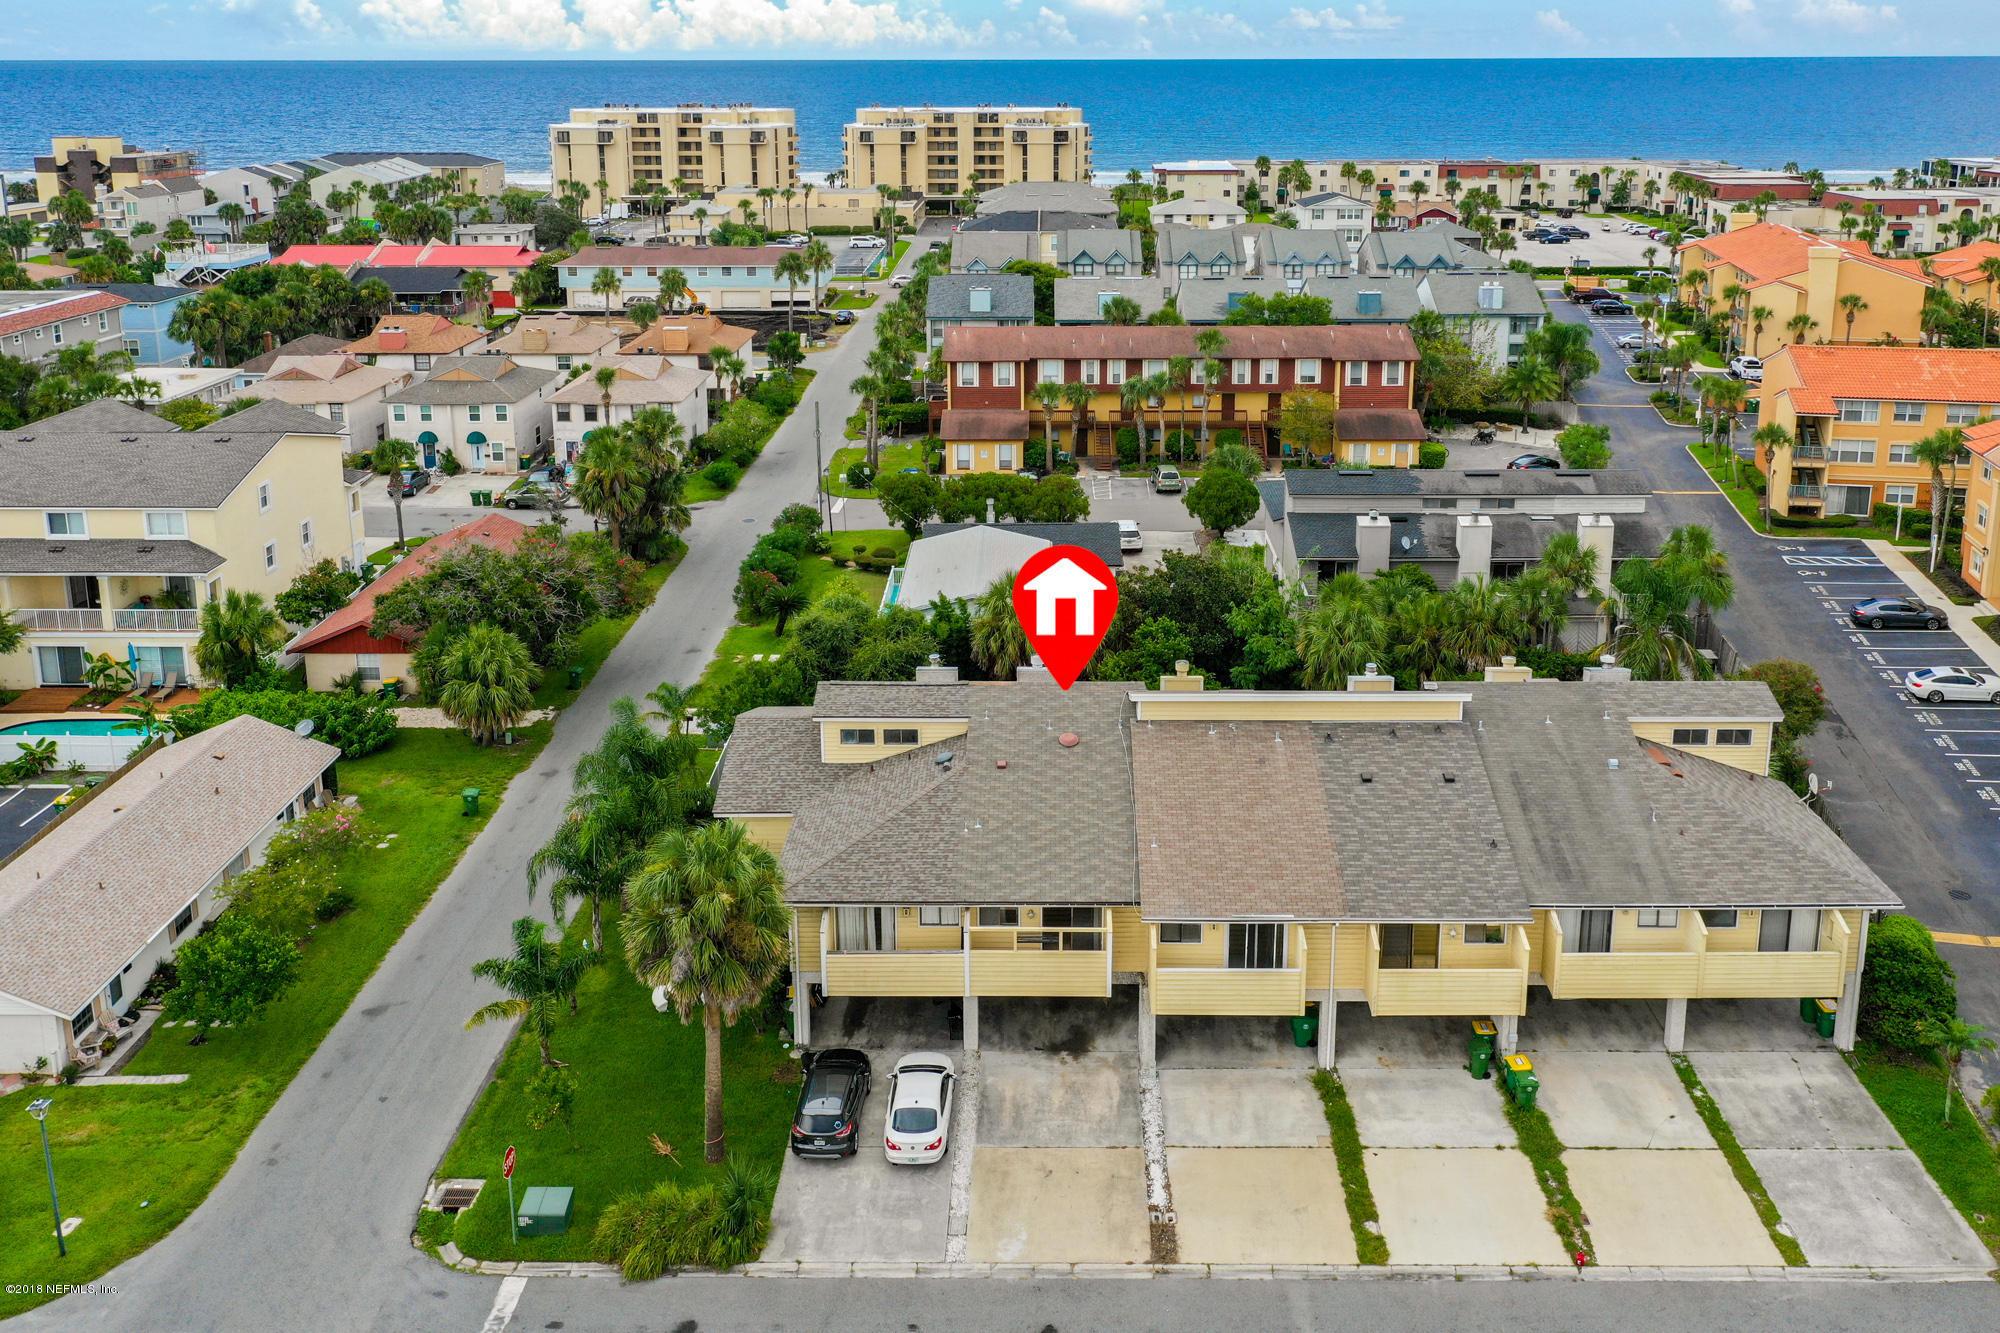 2207 GORDON, JACKSONVILLE BEACH, FLORIDA 32250, 2 Bedrooms Bedrooms, ,2 BathroomsBathrooms,Residential - townhome,For sale,GORDON,955332